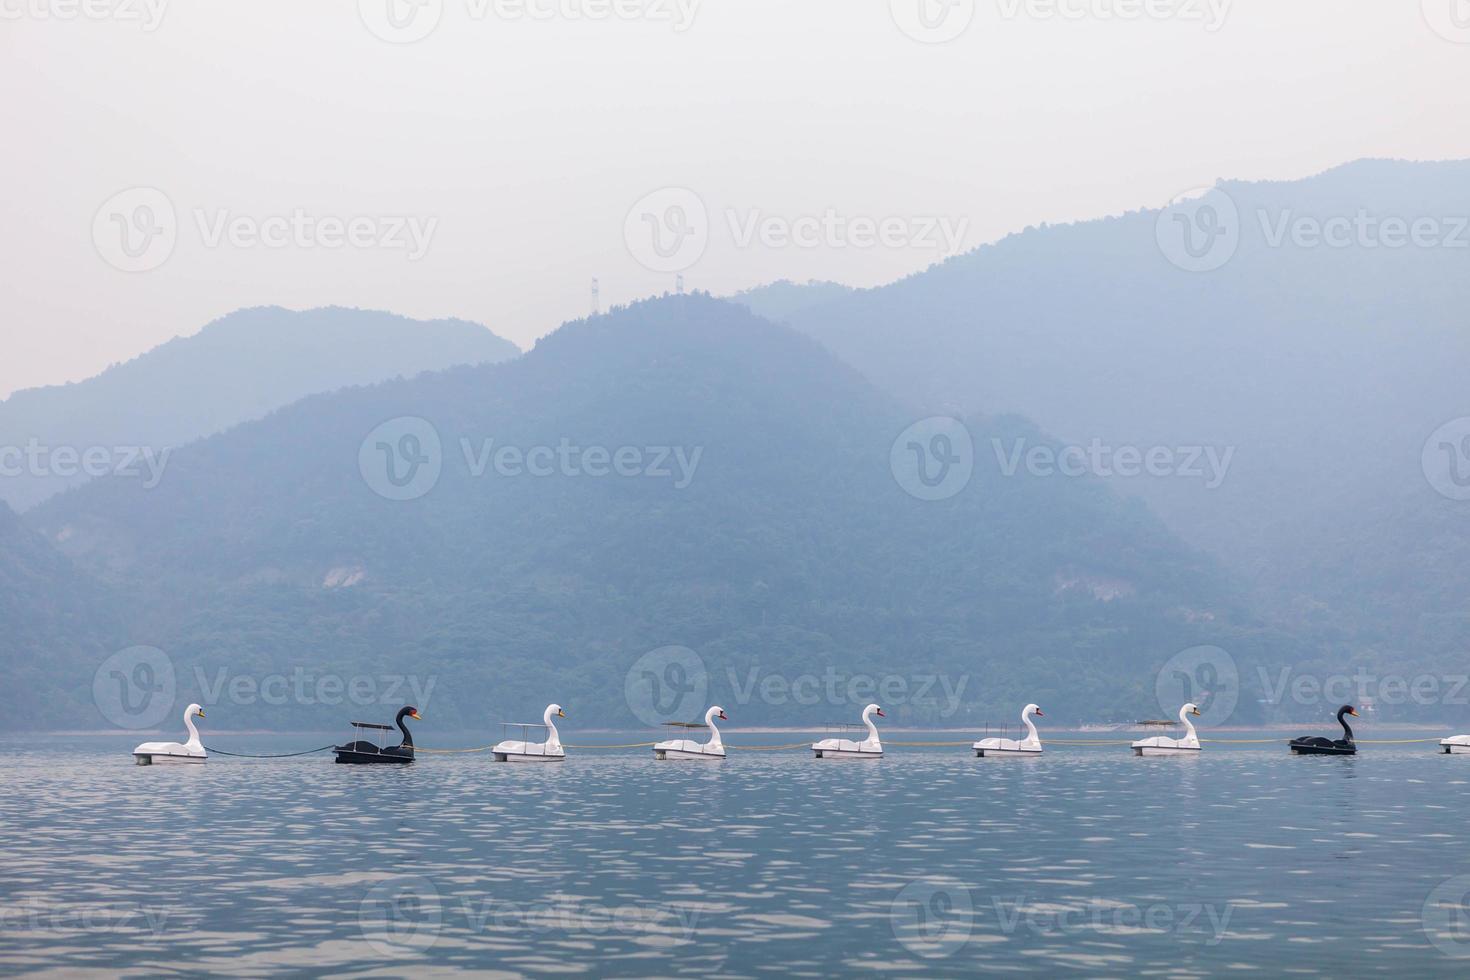 Swan Boats photo